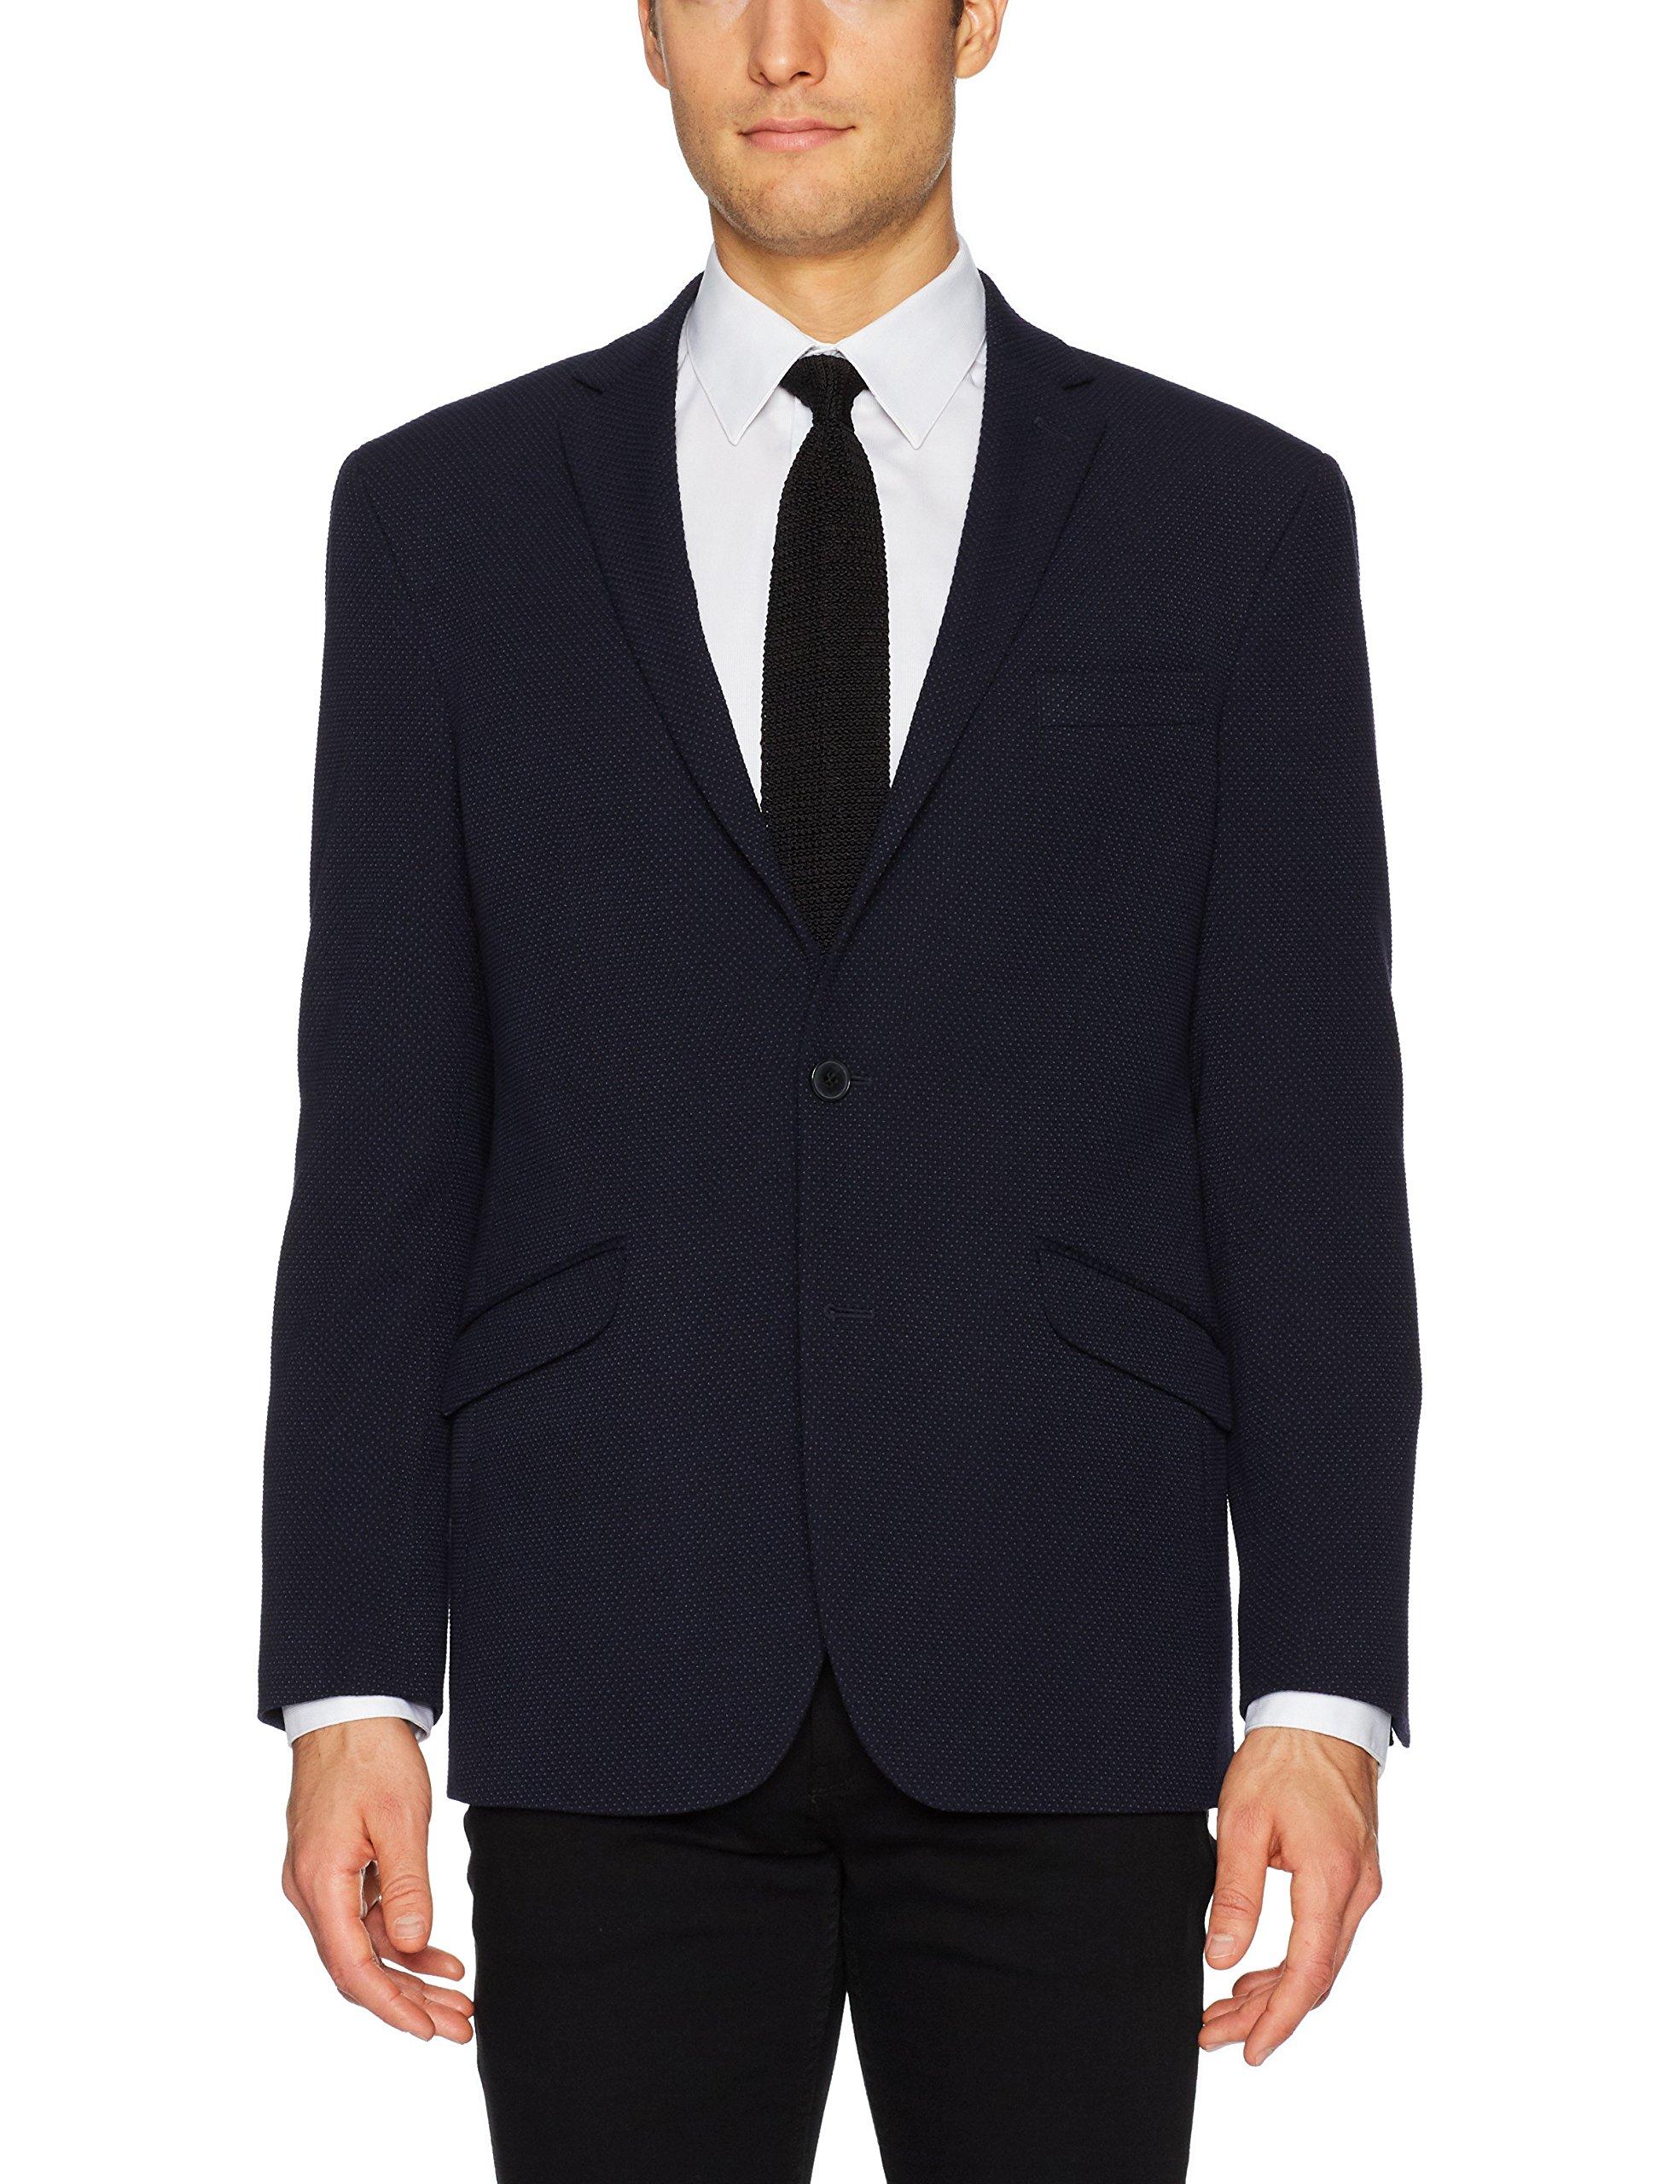 Kenneth Cole REACTION Men's Slim Fit Knit Blazer, Dark Black, 40 Long